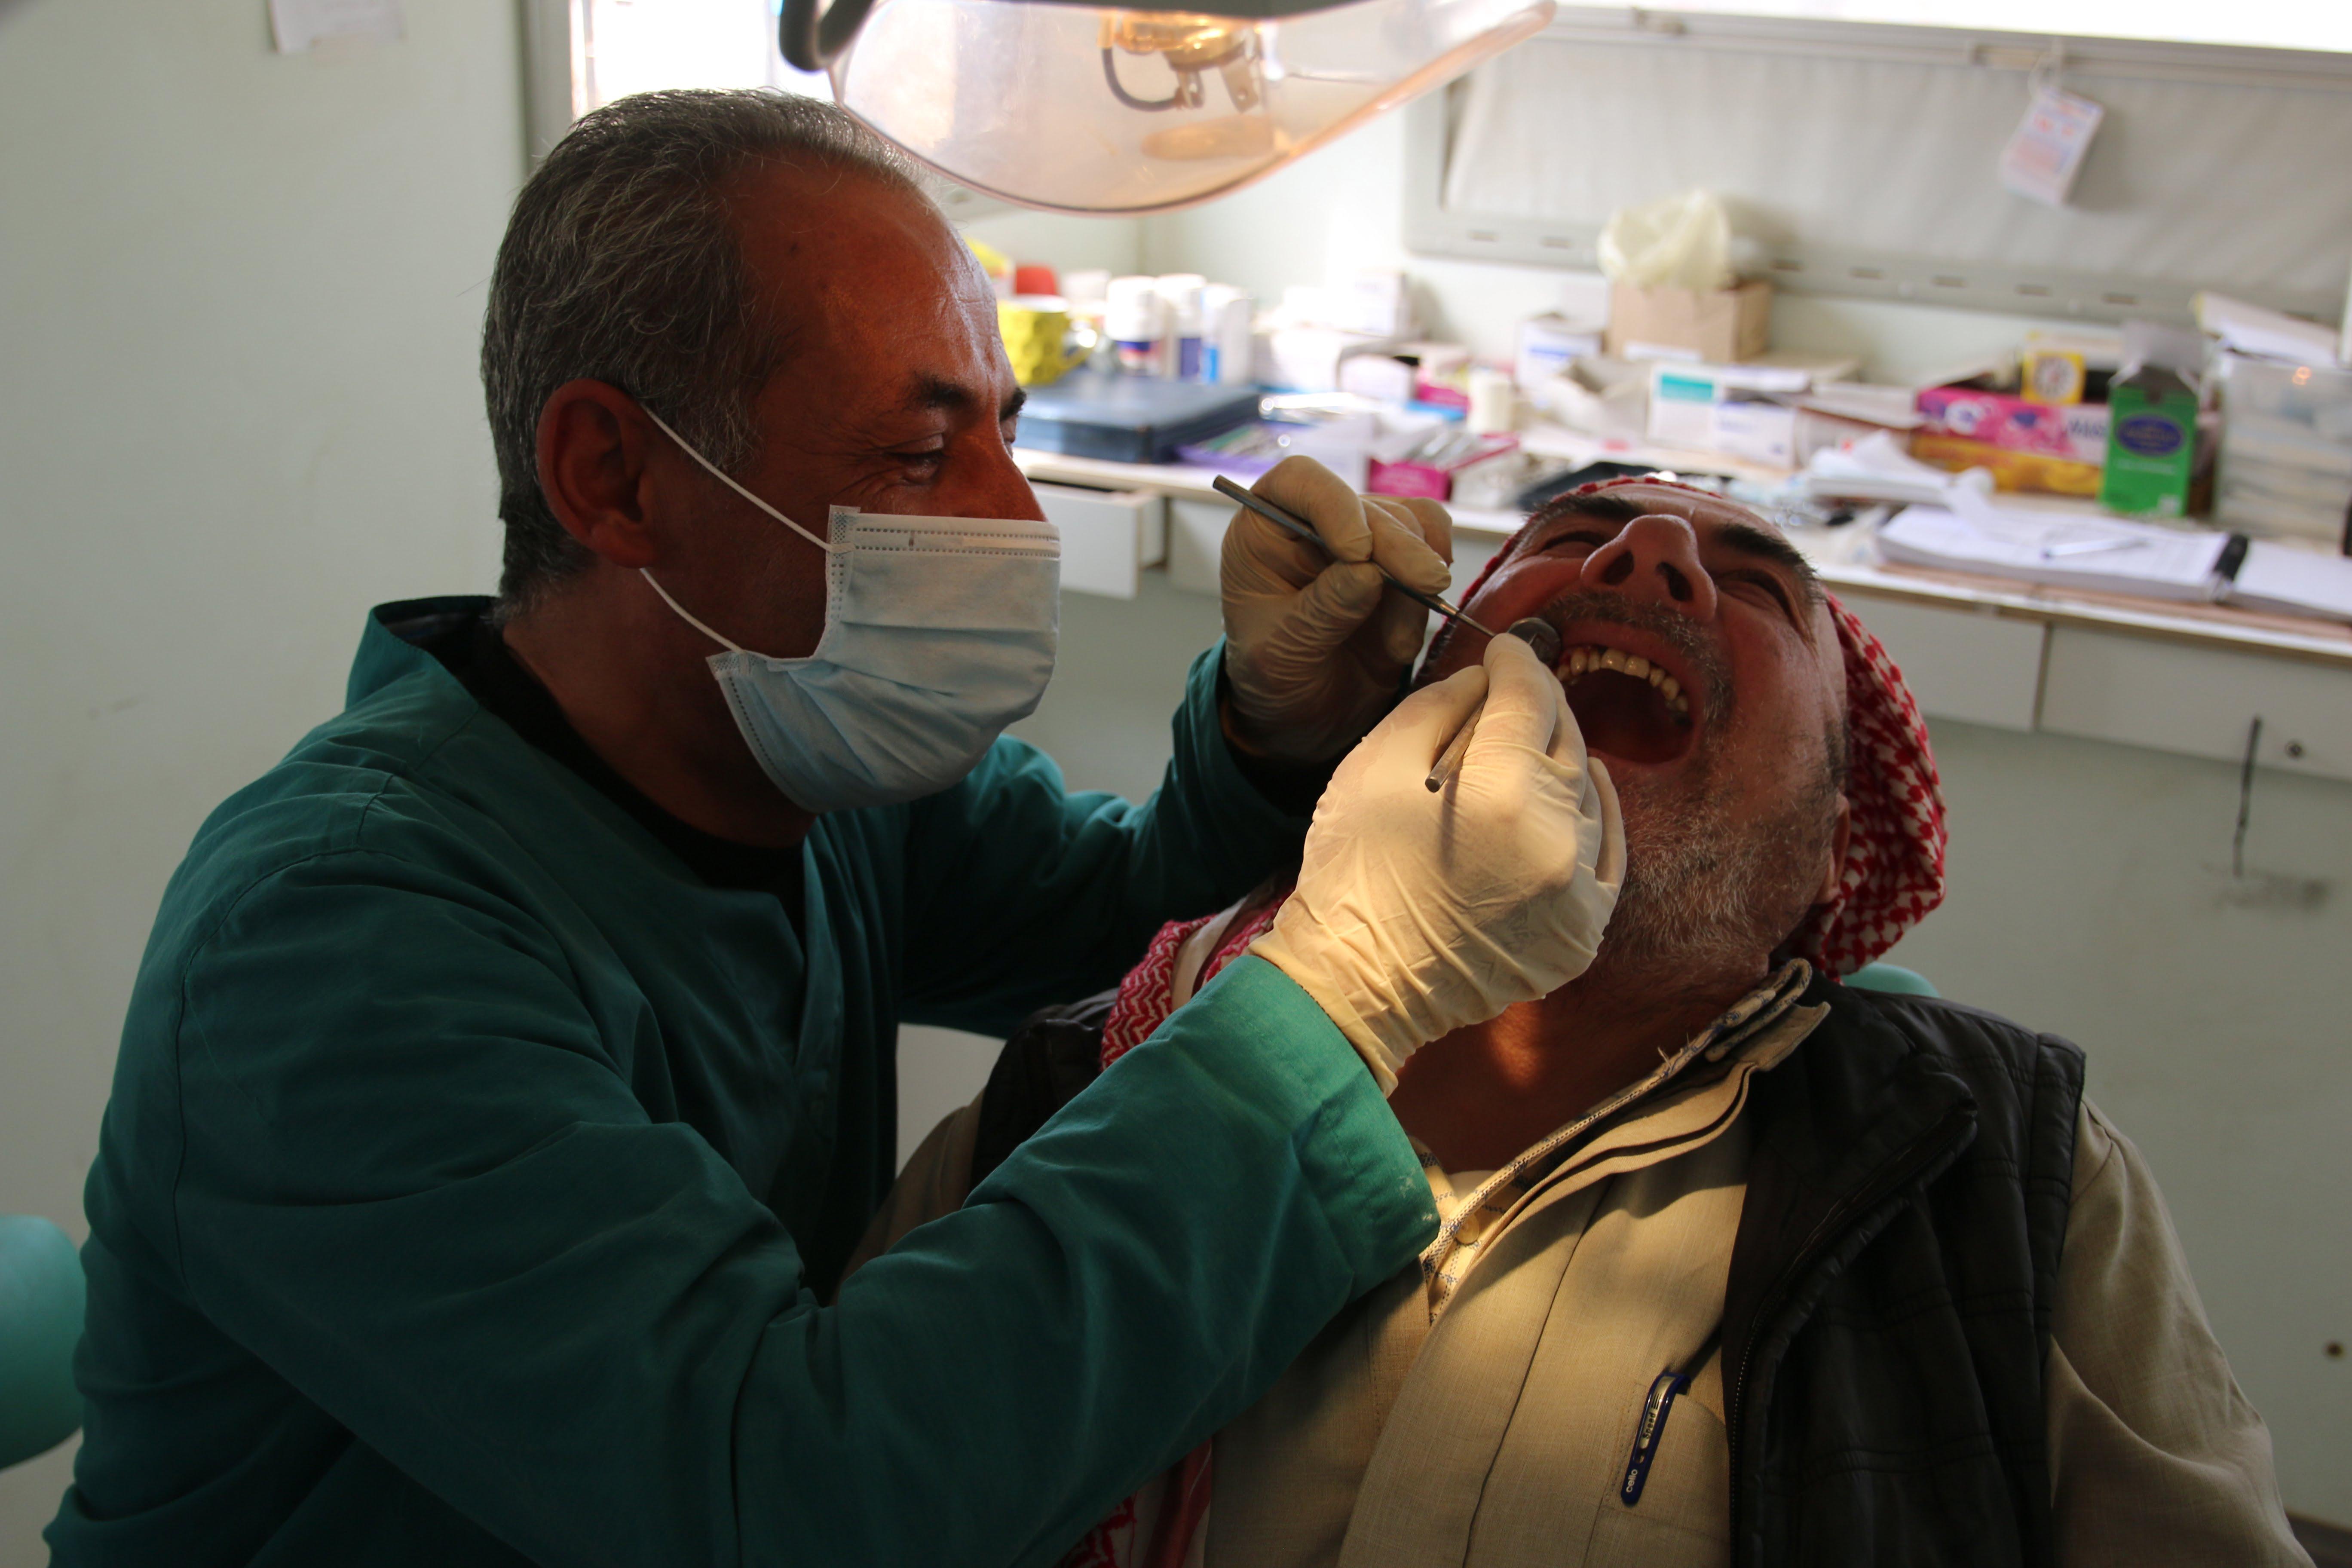 Mobile Dental Clinics – IDA